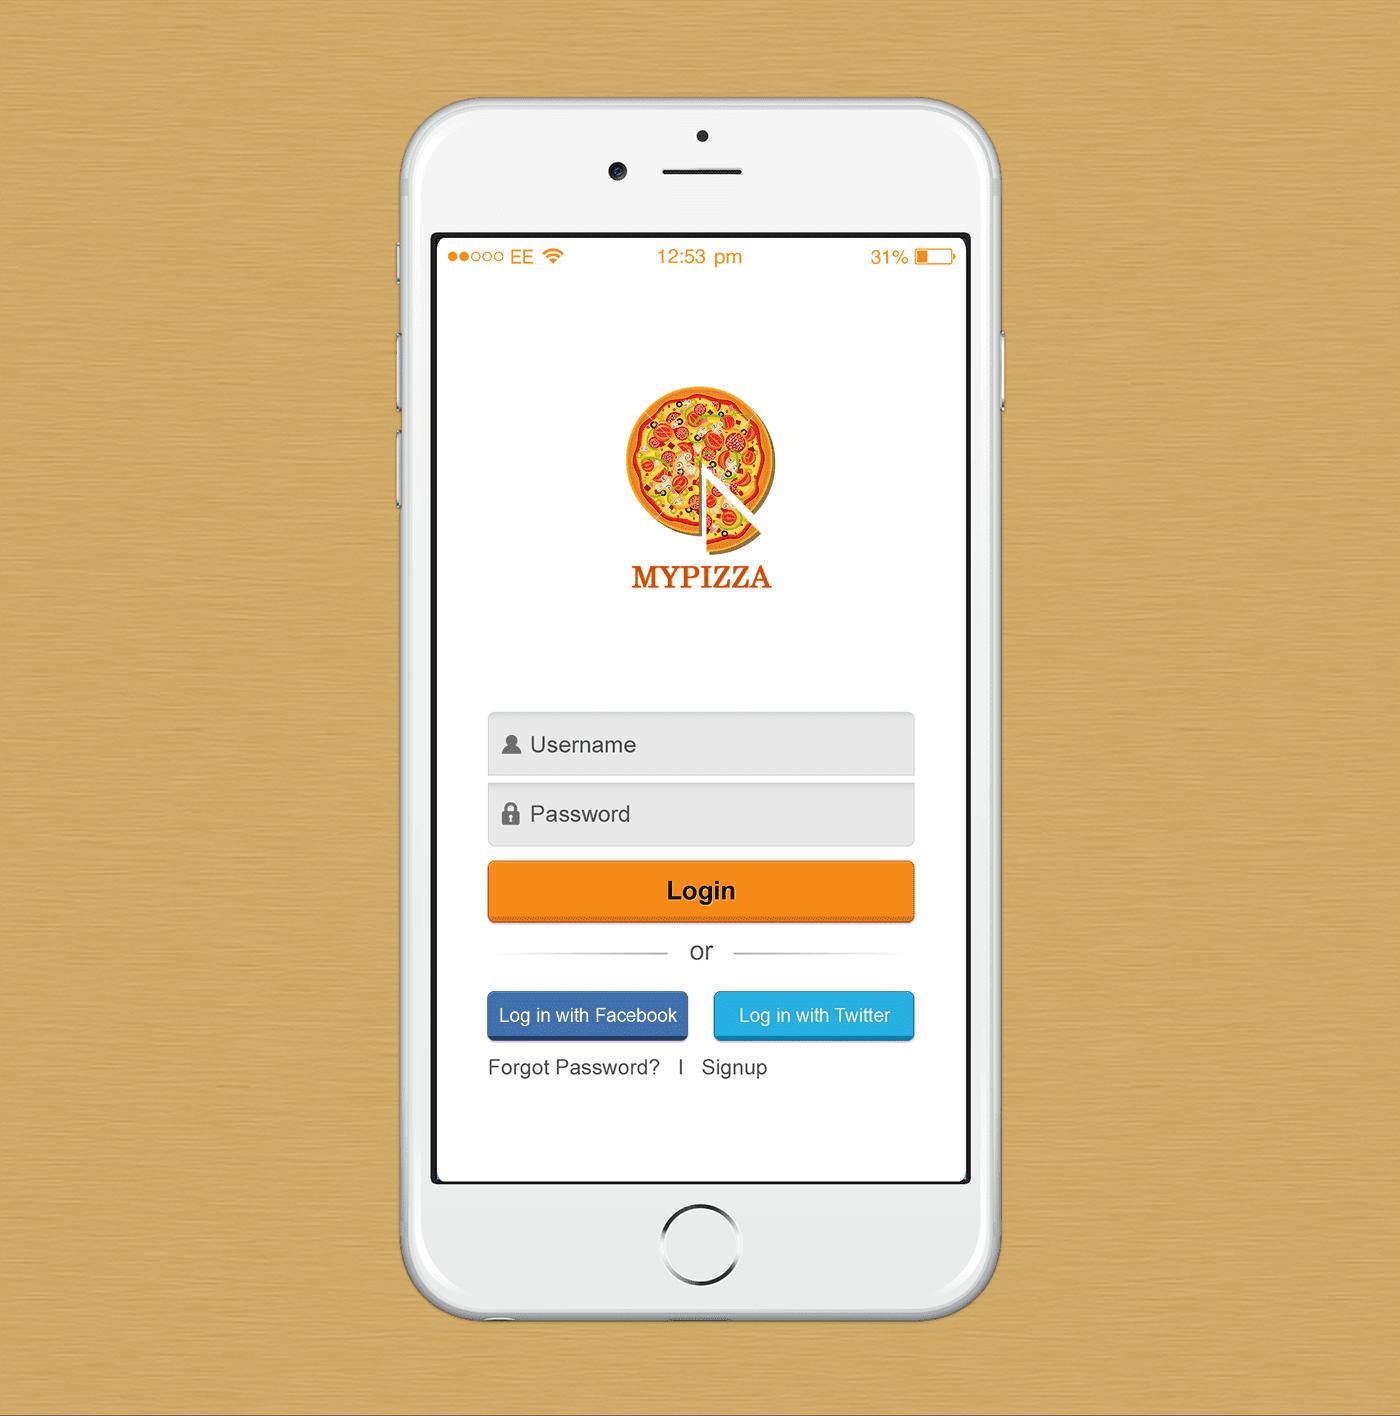 Pizza App Login UI Designs